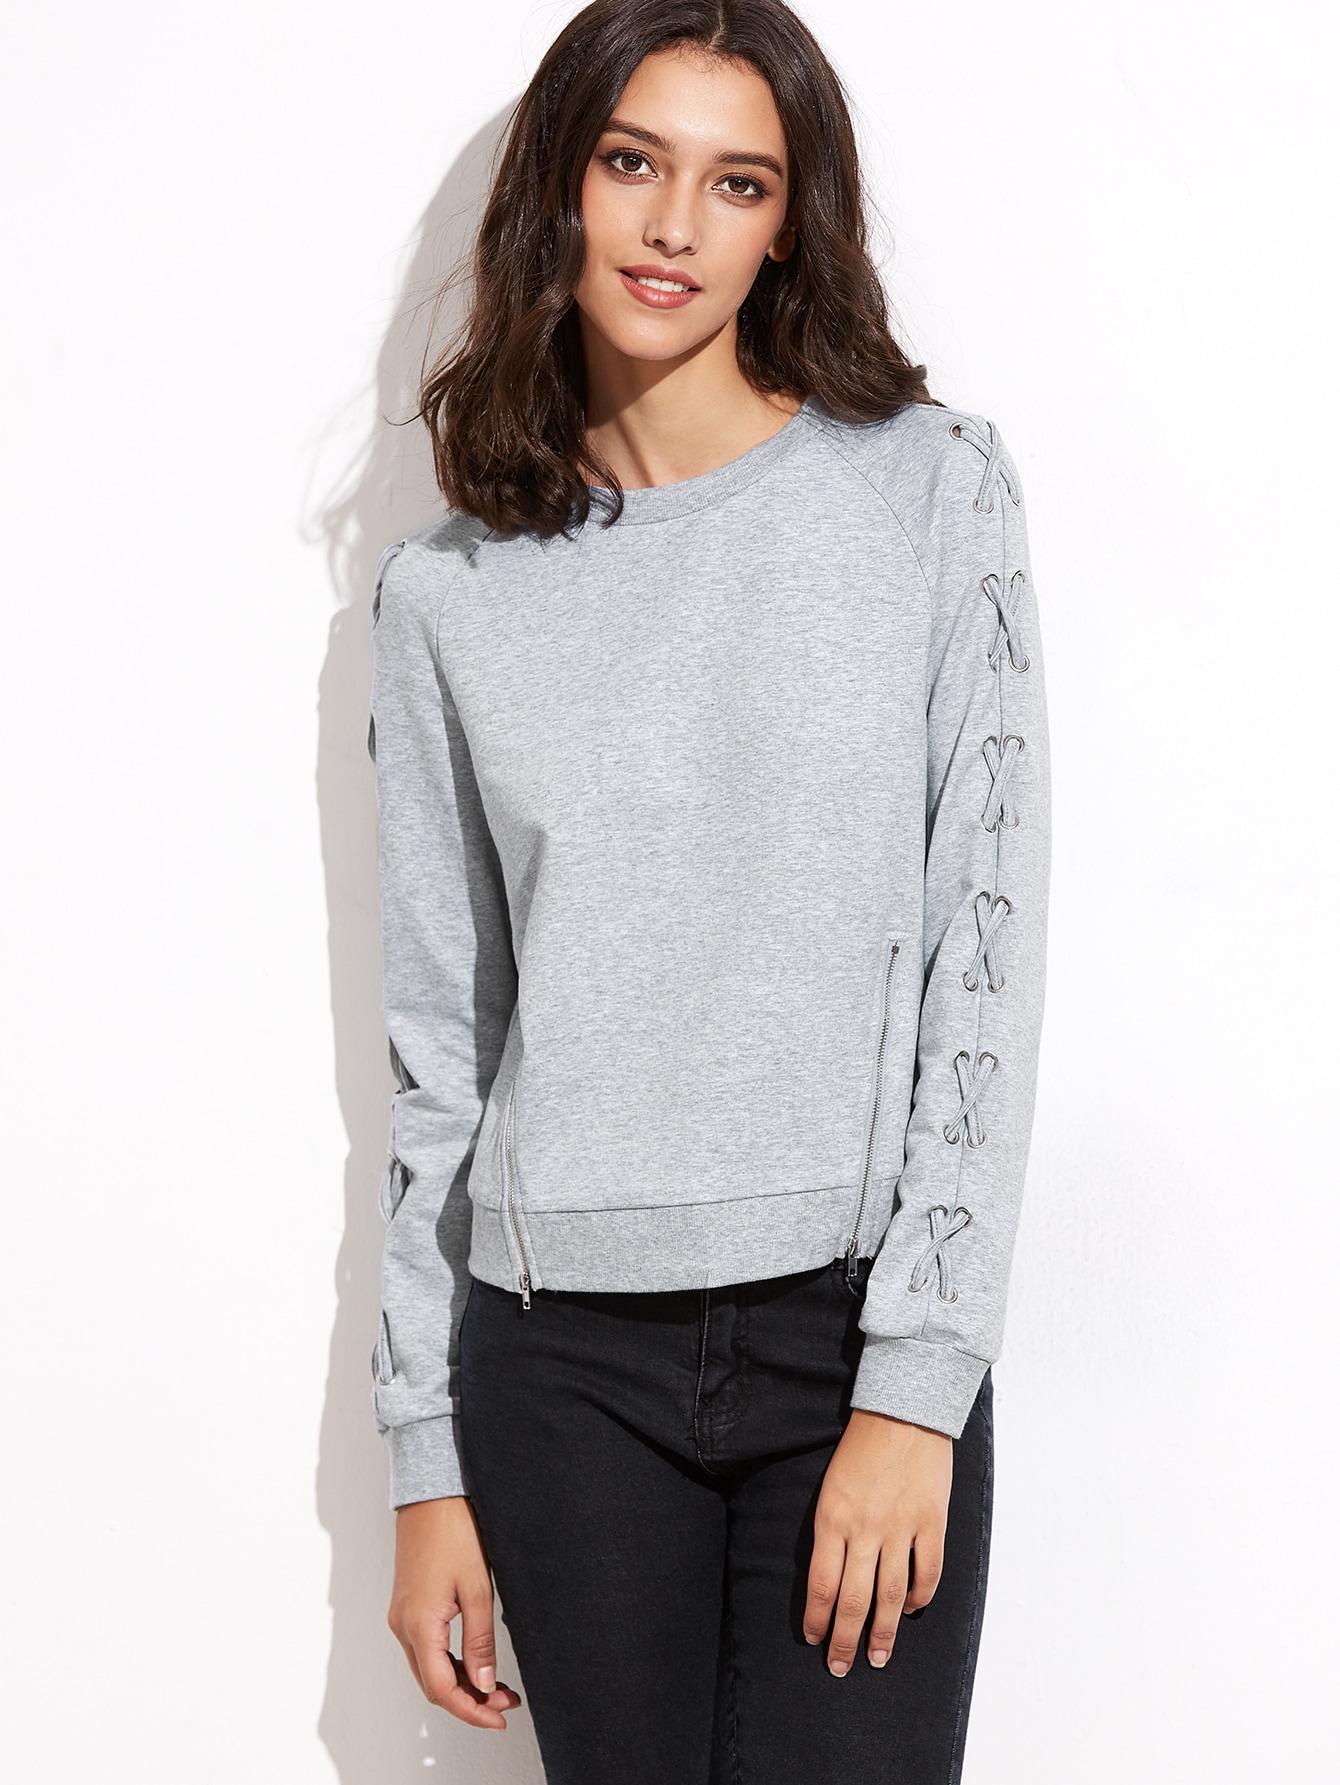 Heather Grey Lace Up Sleeve Dual Zip Front Sweatshirt sweatshirt160902703